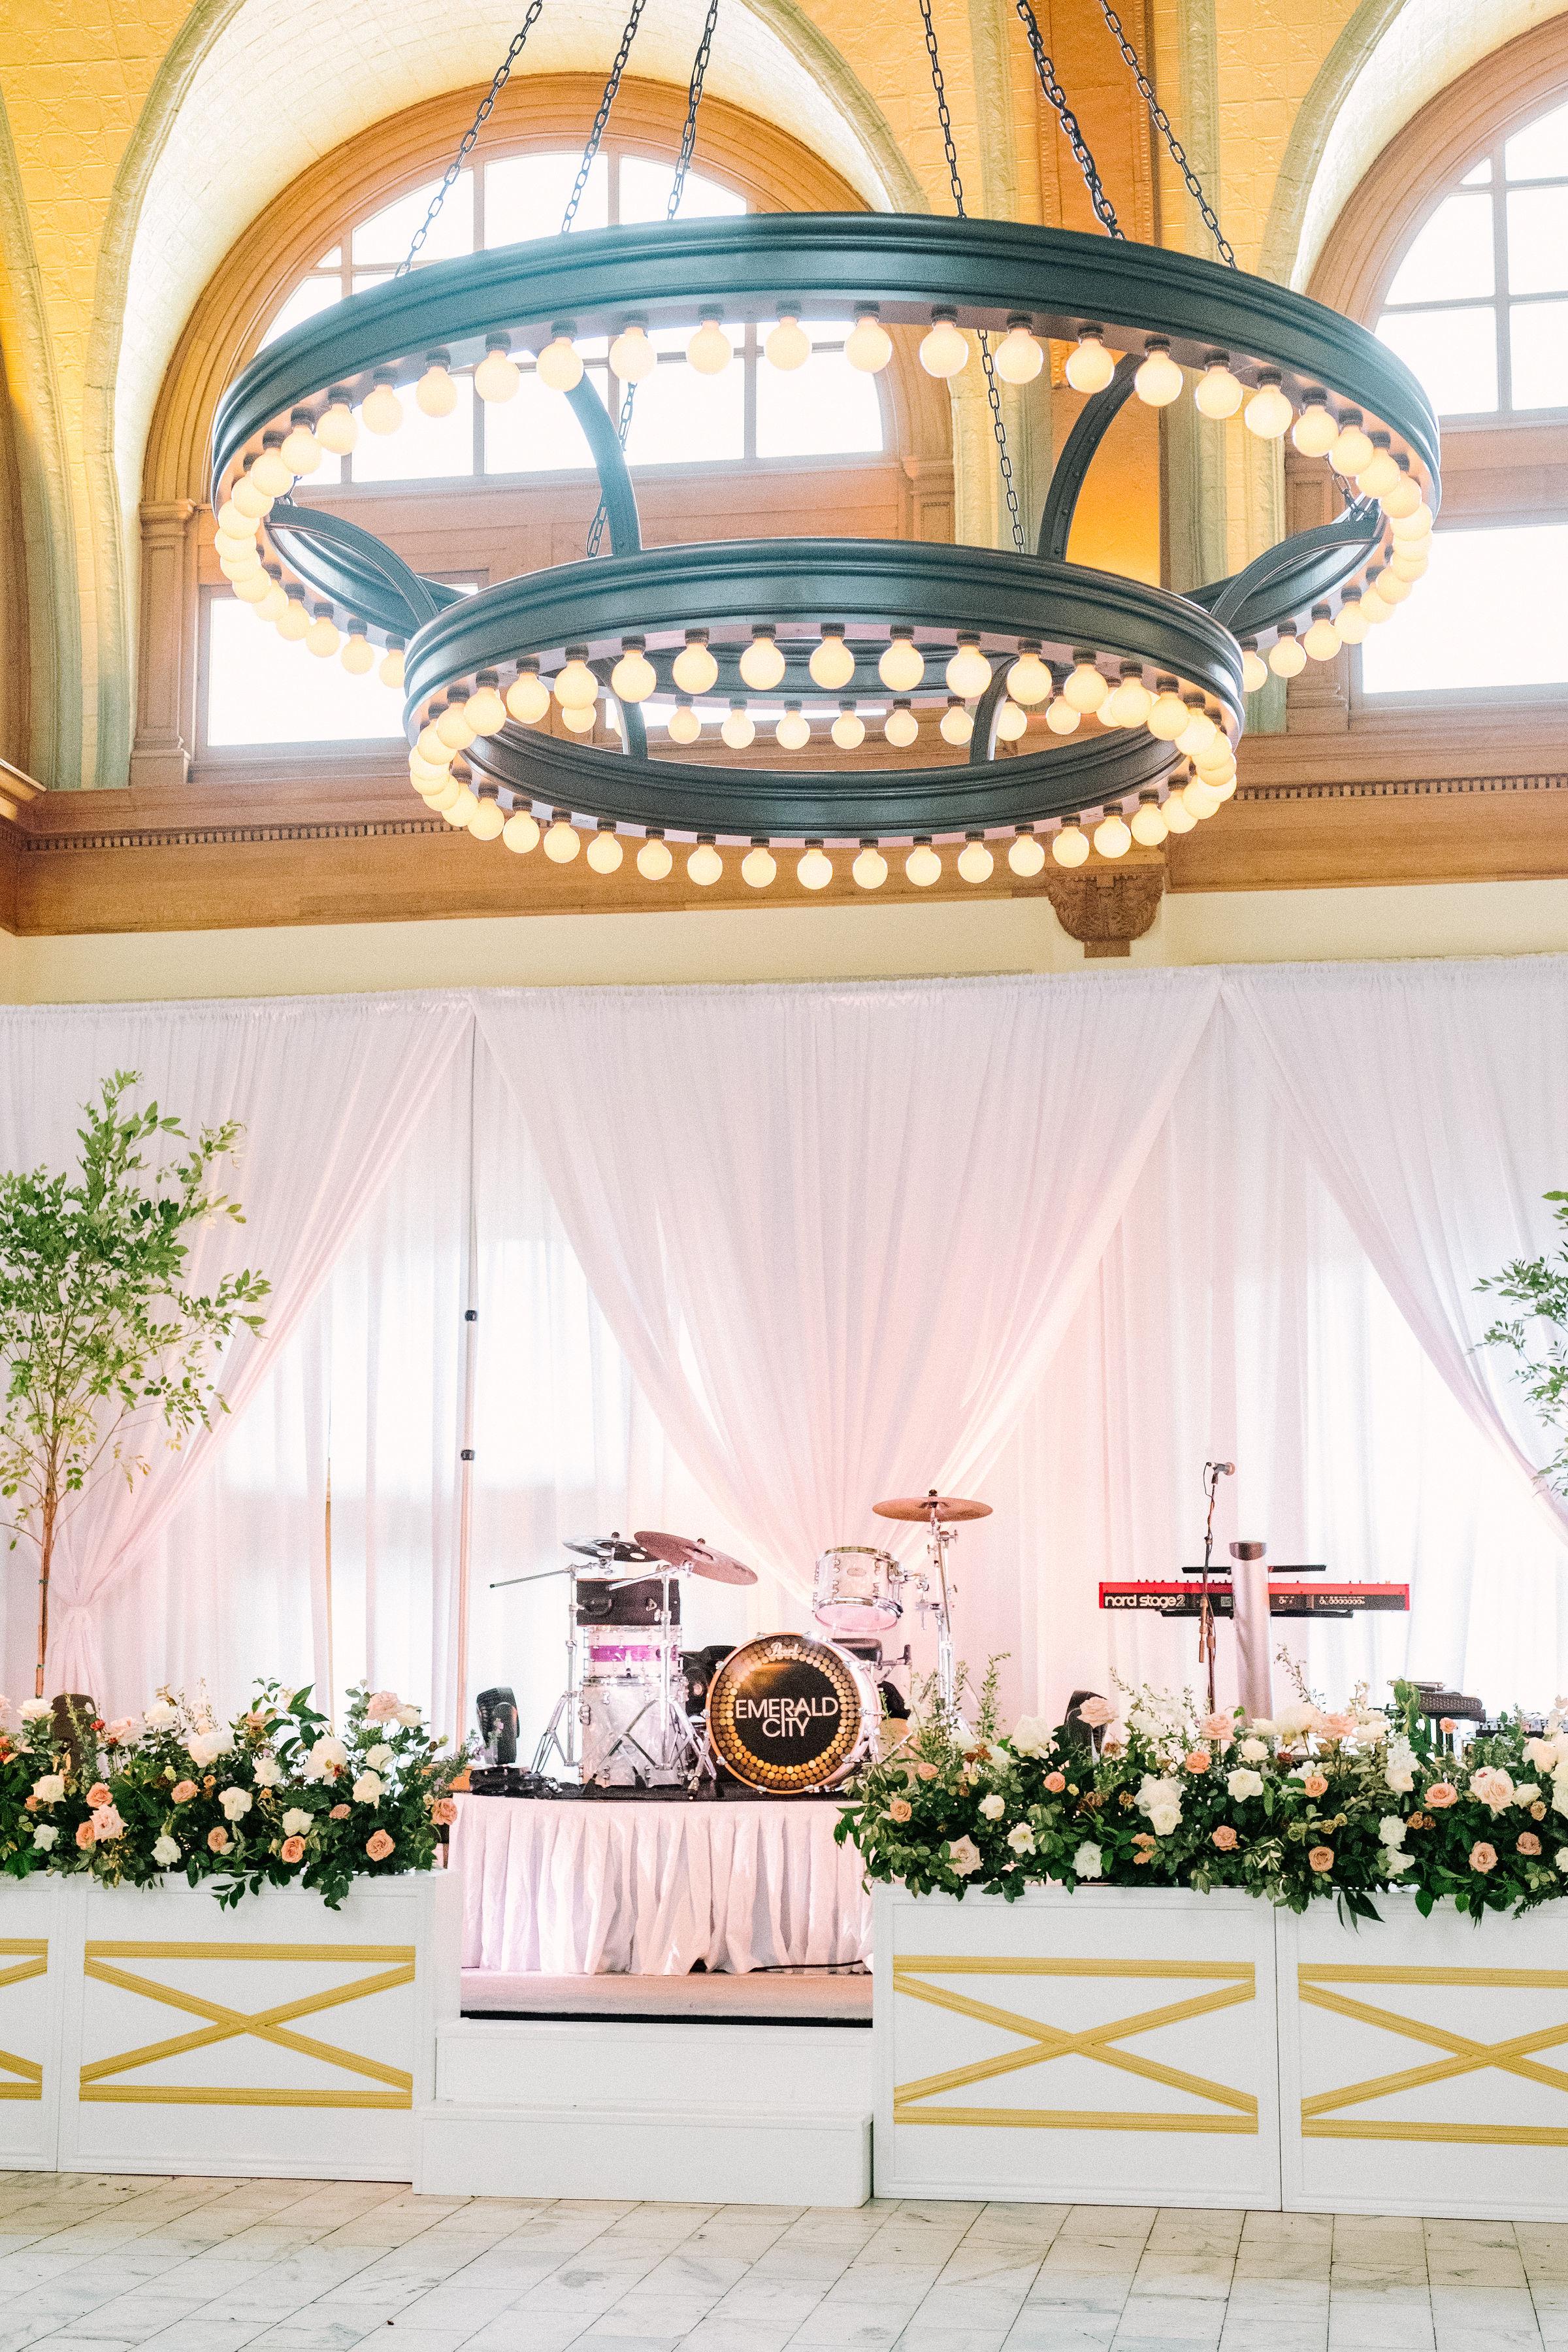 Ellen-Ashton-Photography-Girt-and-gold-events-weddings-Ashton-Depot-Weddings689.jpg